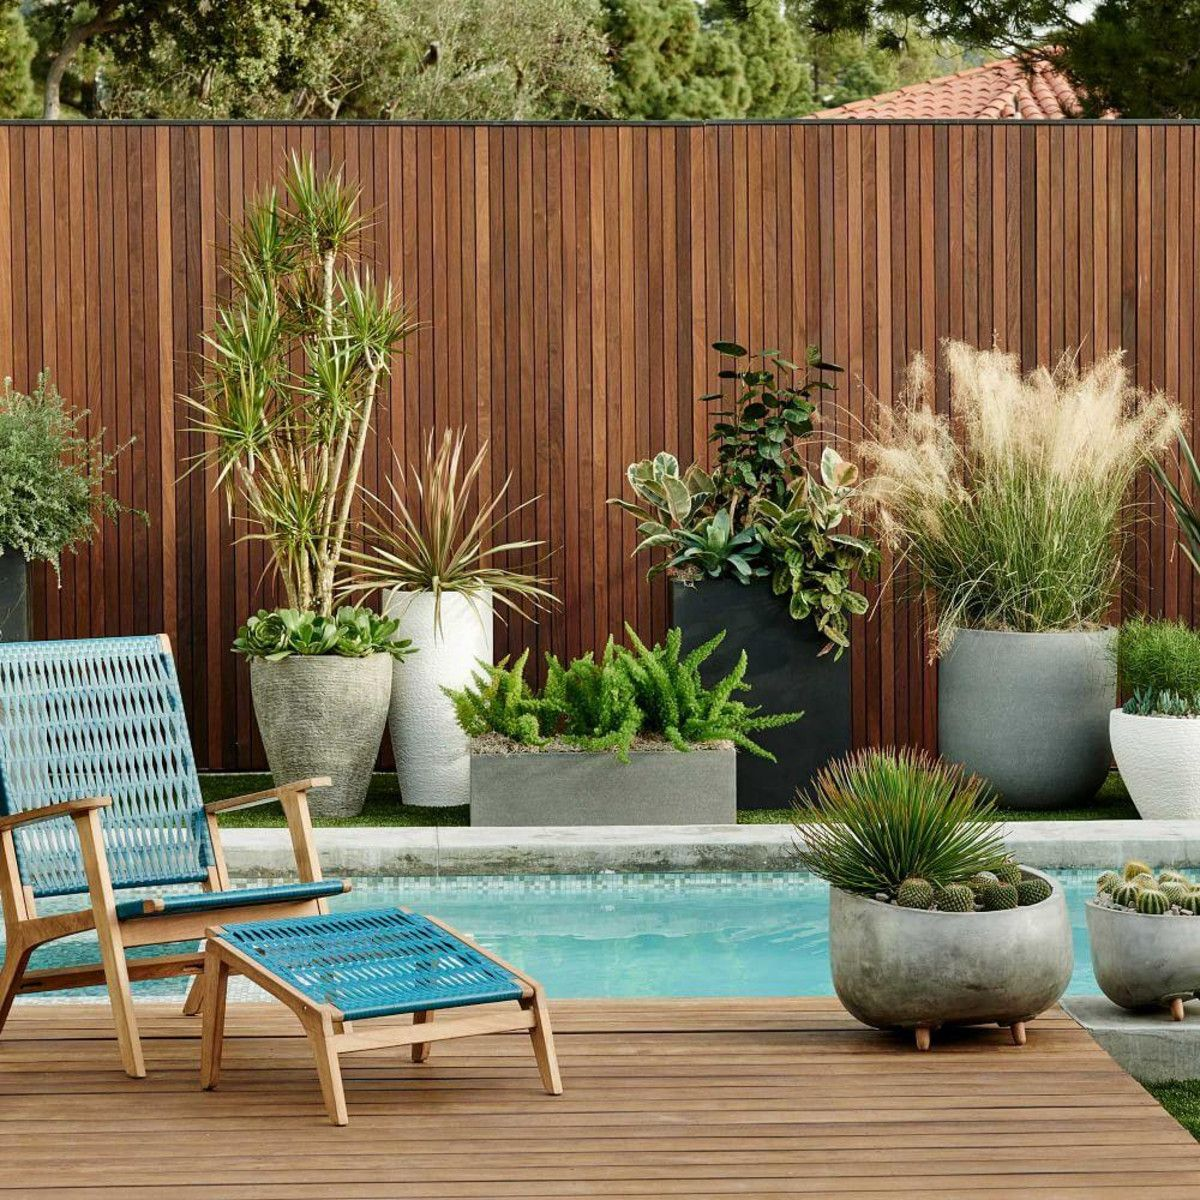 Catskill Wood + Wicker Chair - Teak/Teal | Garden ideas | Pinterest ...